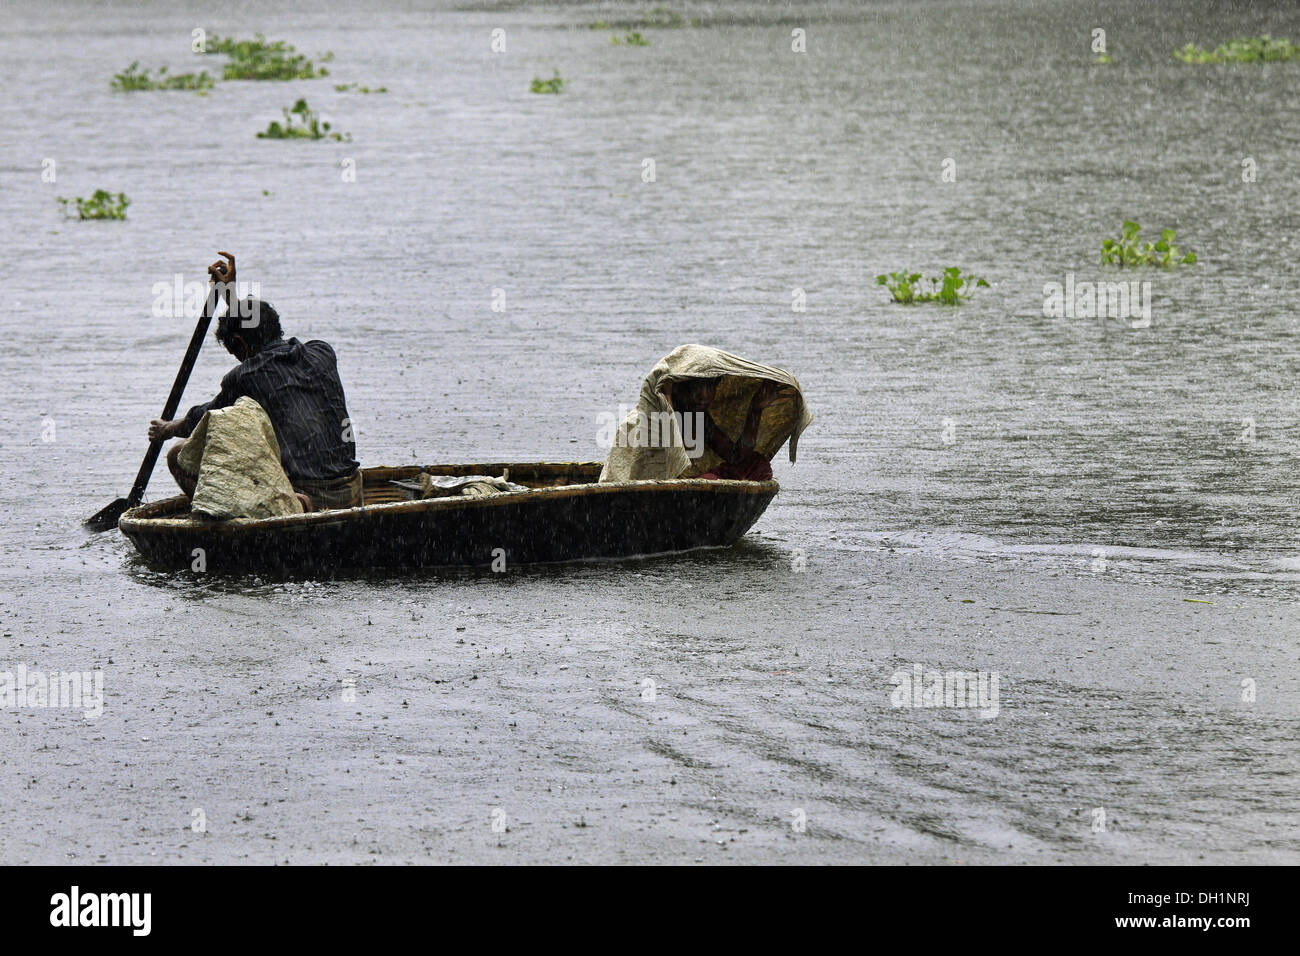 man rowing paddling circular round boat punnamada lake Alleppey Kerala India - Stock Image